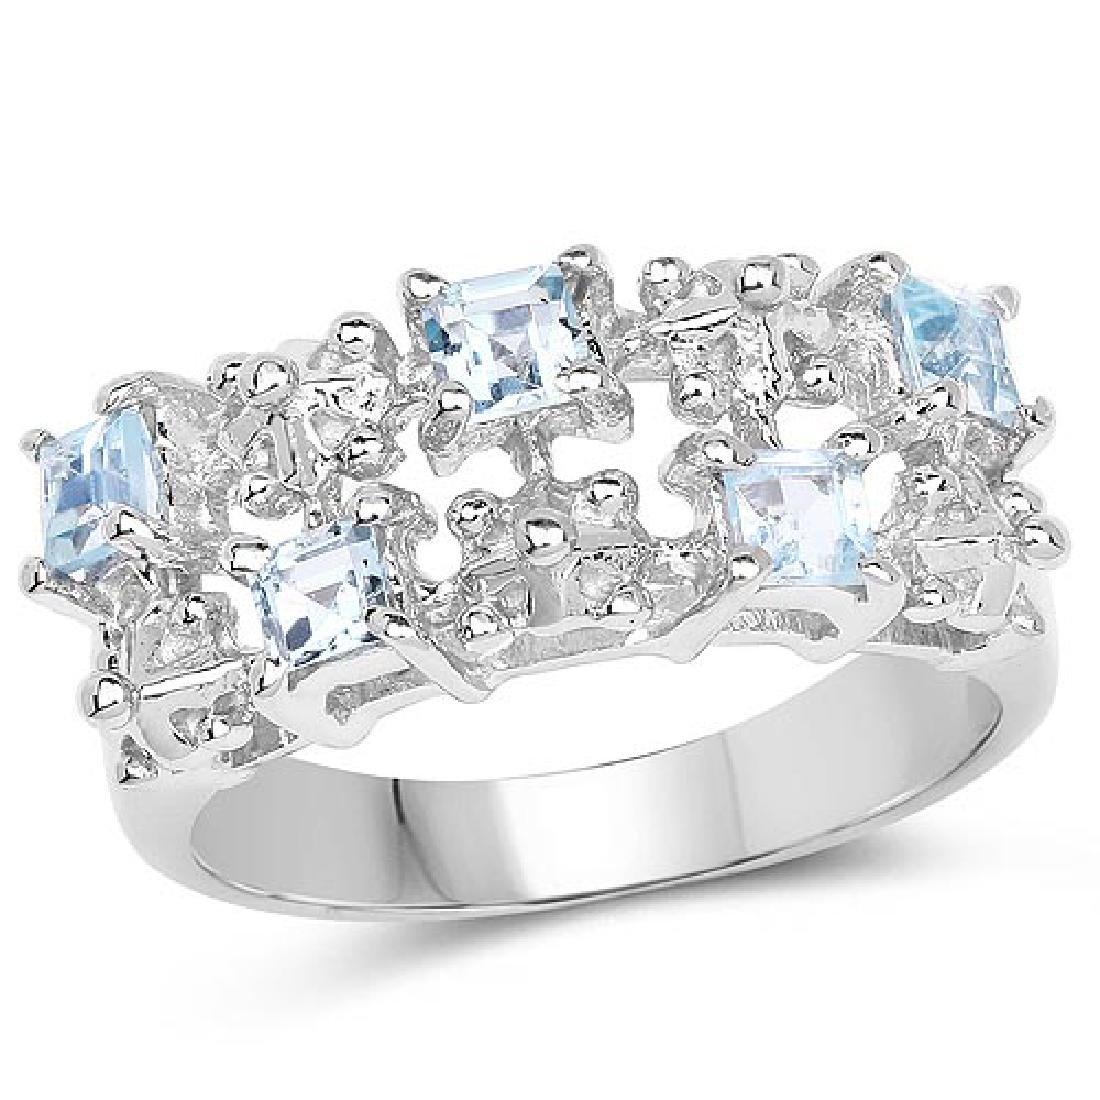 0.95 Carat Genuine Blue Topaz .925 Sterling Silver Ring